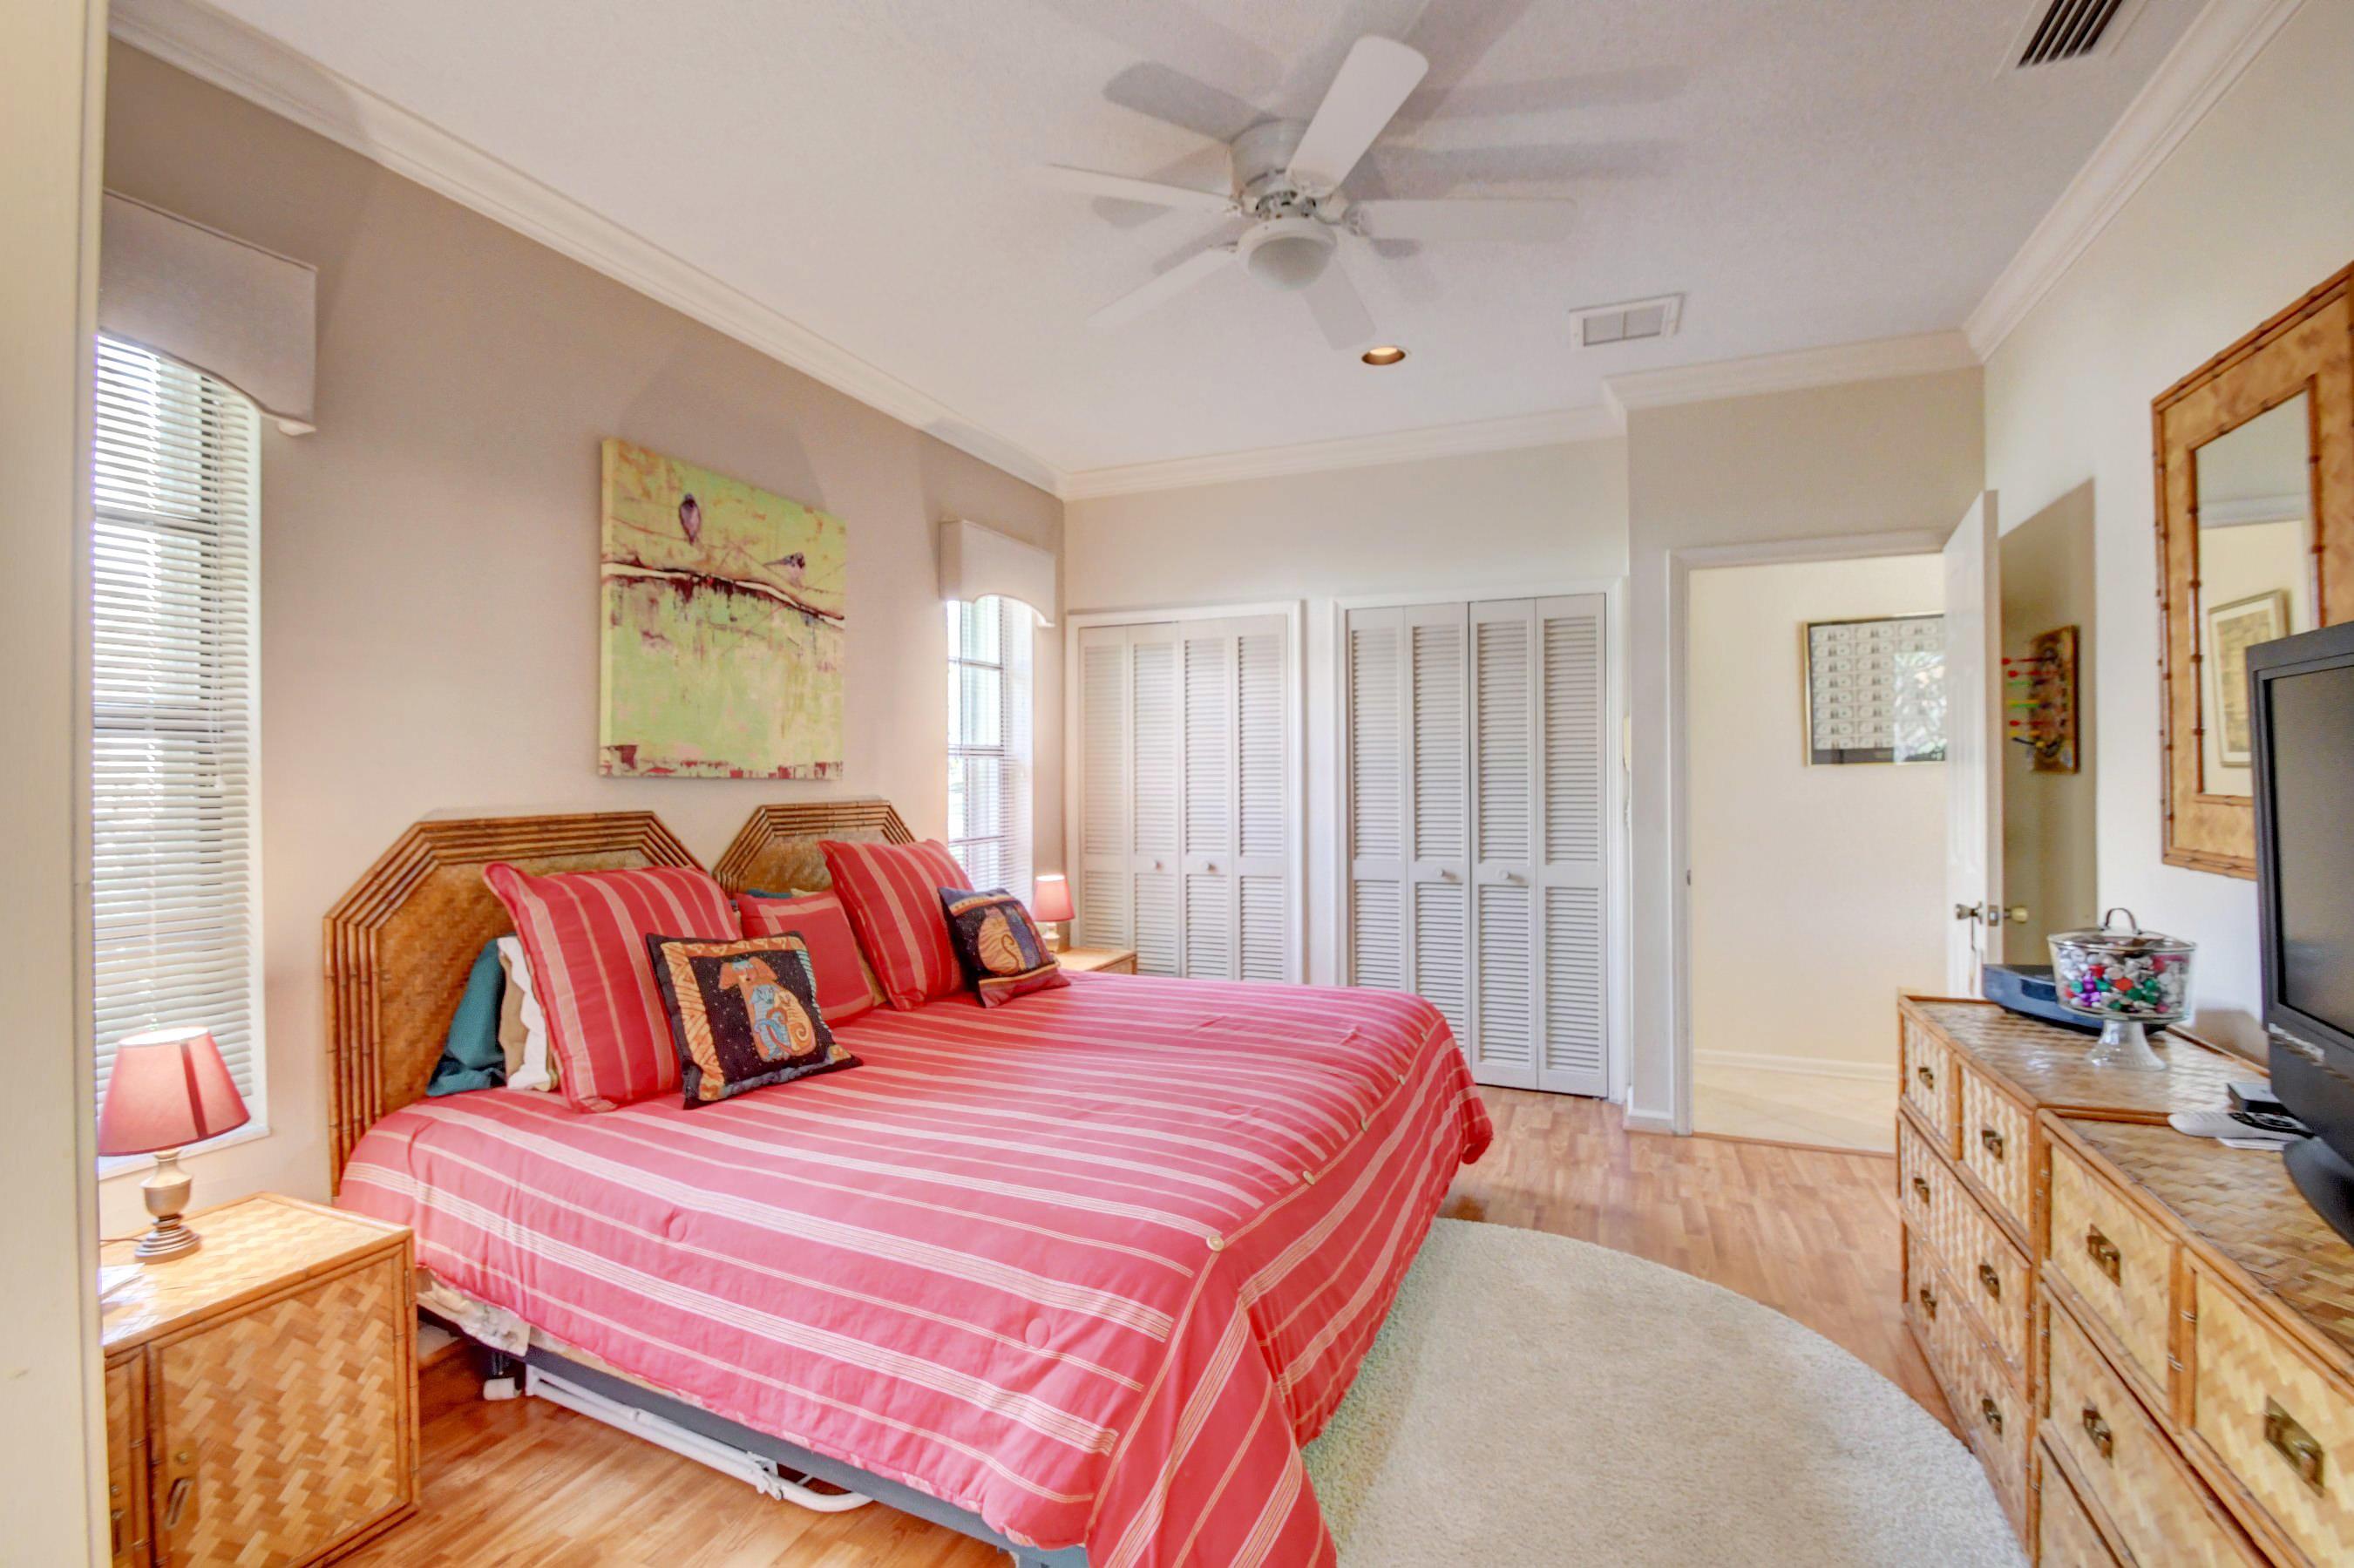 10723 Stonebridge Boulevard, Boca Raton, Florida 33498, 3 Bedrooms Bedrooms, ,3.1 BathroomsBathrooms,Single Family,For Sale,STONEBRIDGE,Stonebridge,RX-10412657